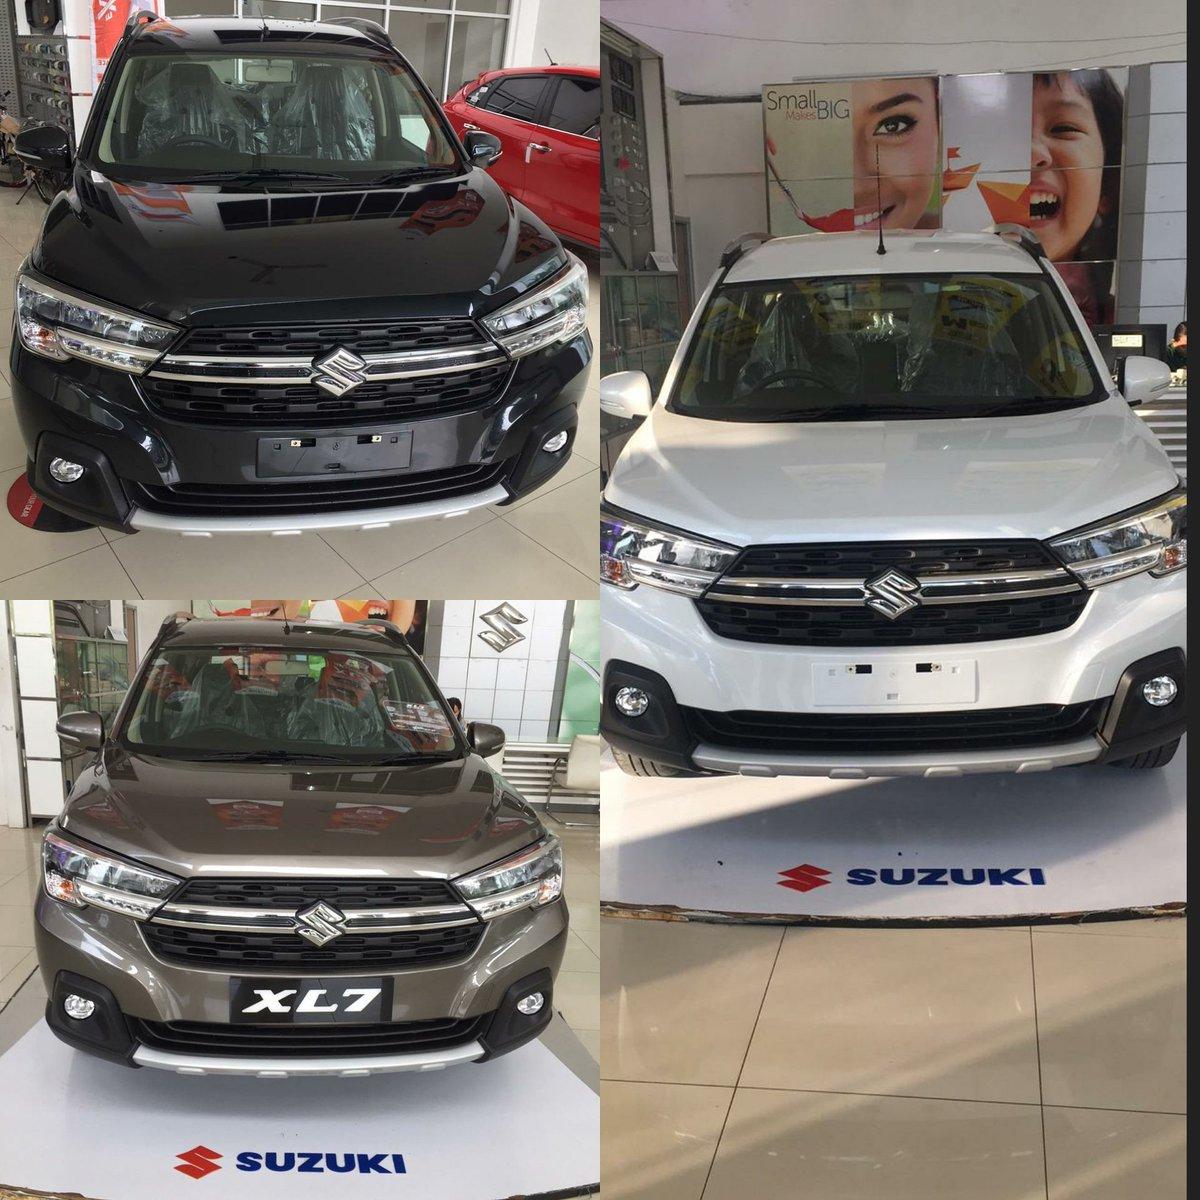 Ready Stock Suzuki XL7 RP 215 Juta  Tipe Zeta & Beta: ✓ Putih ✓ Hitam ✓ Magma Grey Tipe Alpha : Indent  AZIZ 0811 9166 236 Melayani Area JADETABEK  #xl7 #suzukixl7 #jualmobil #promosuzuki #malamjumat #KamisanOnline